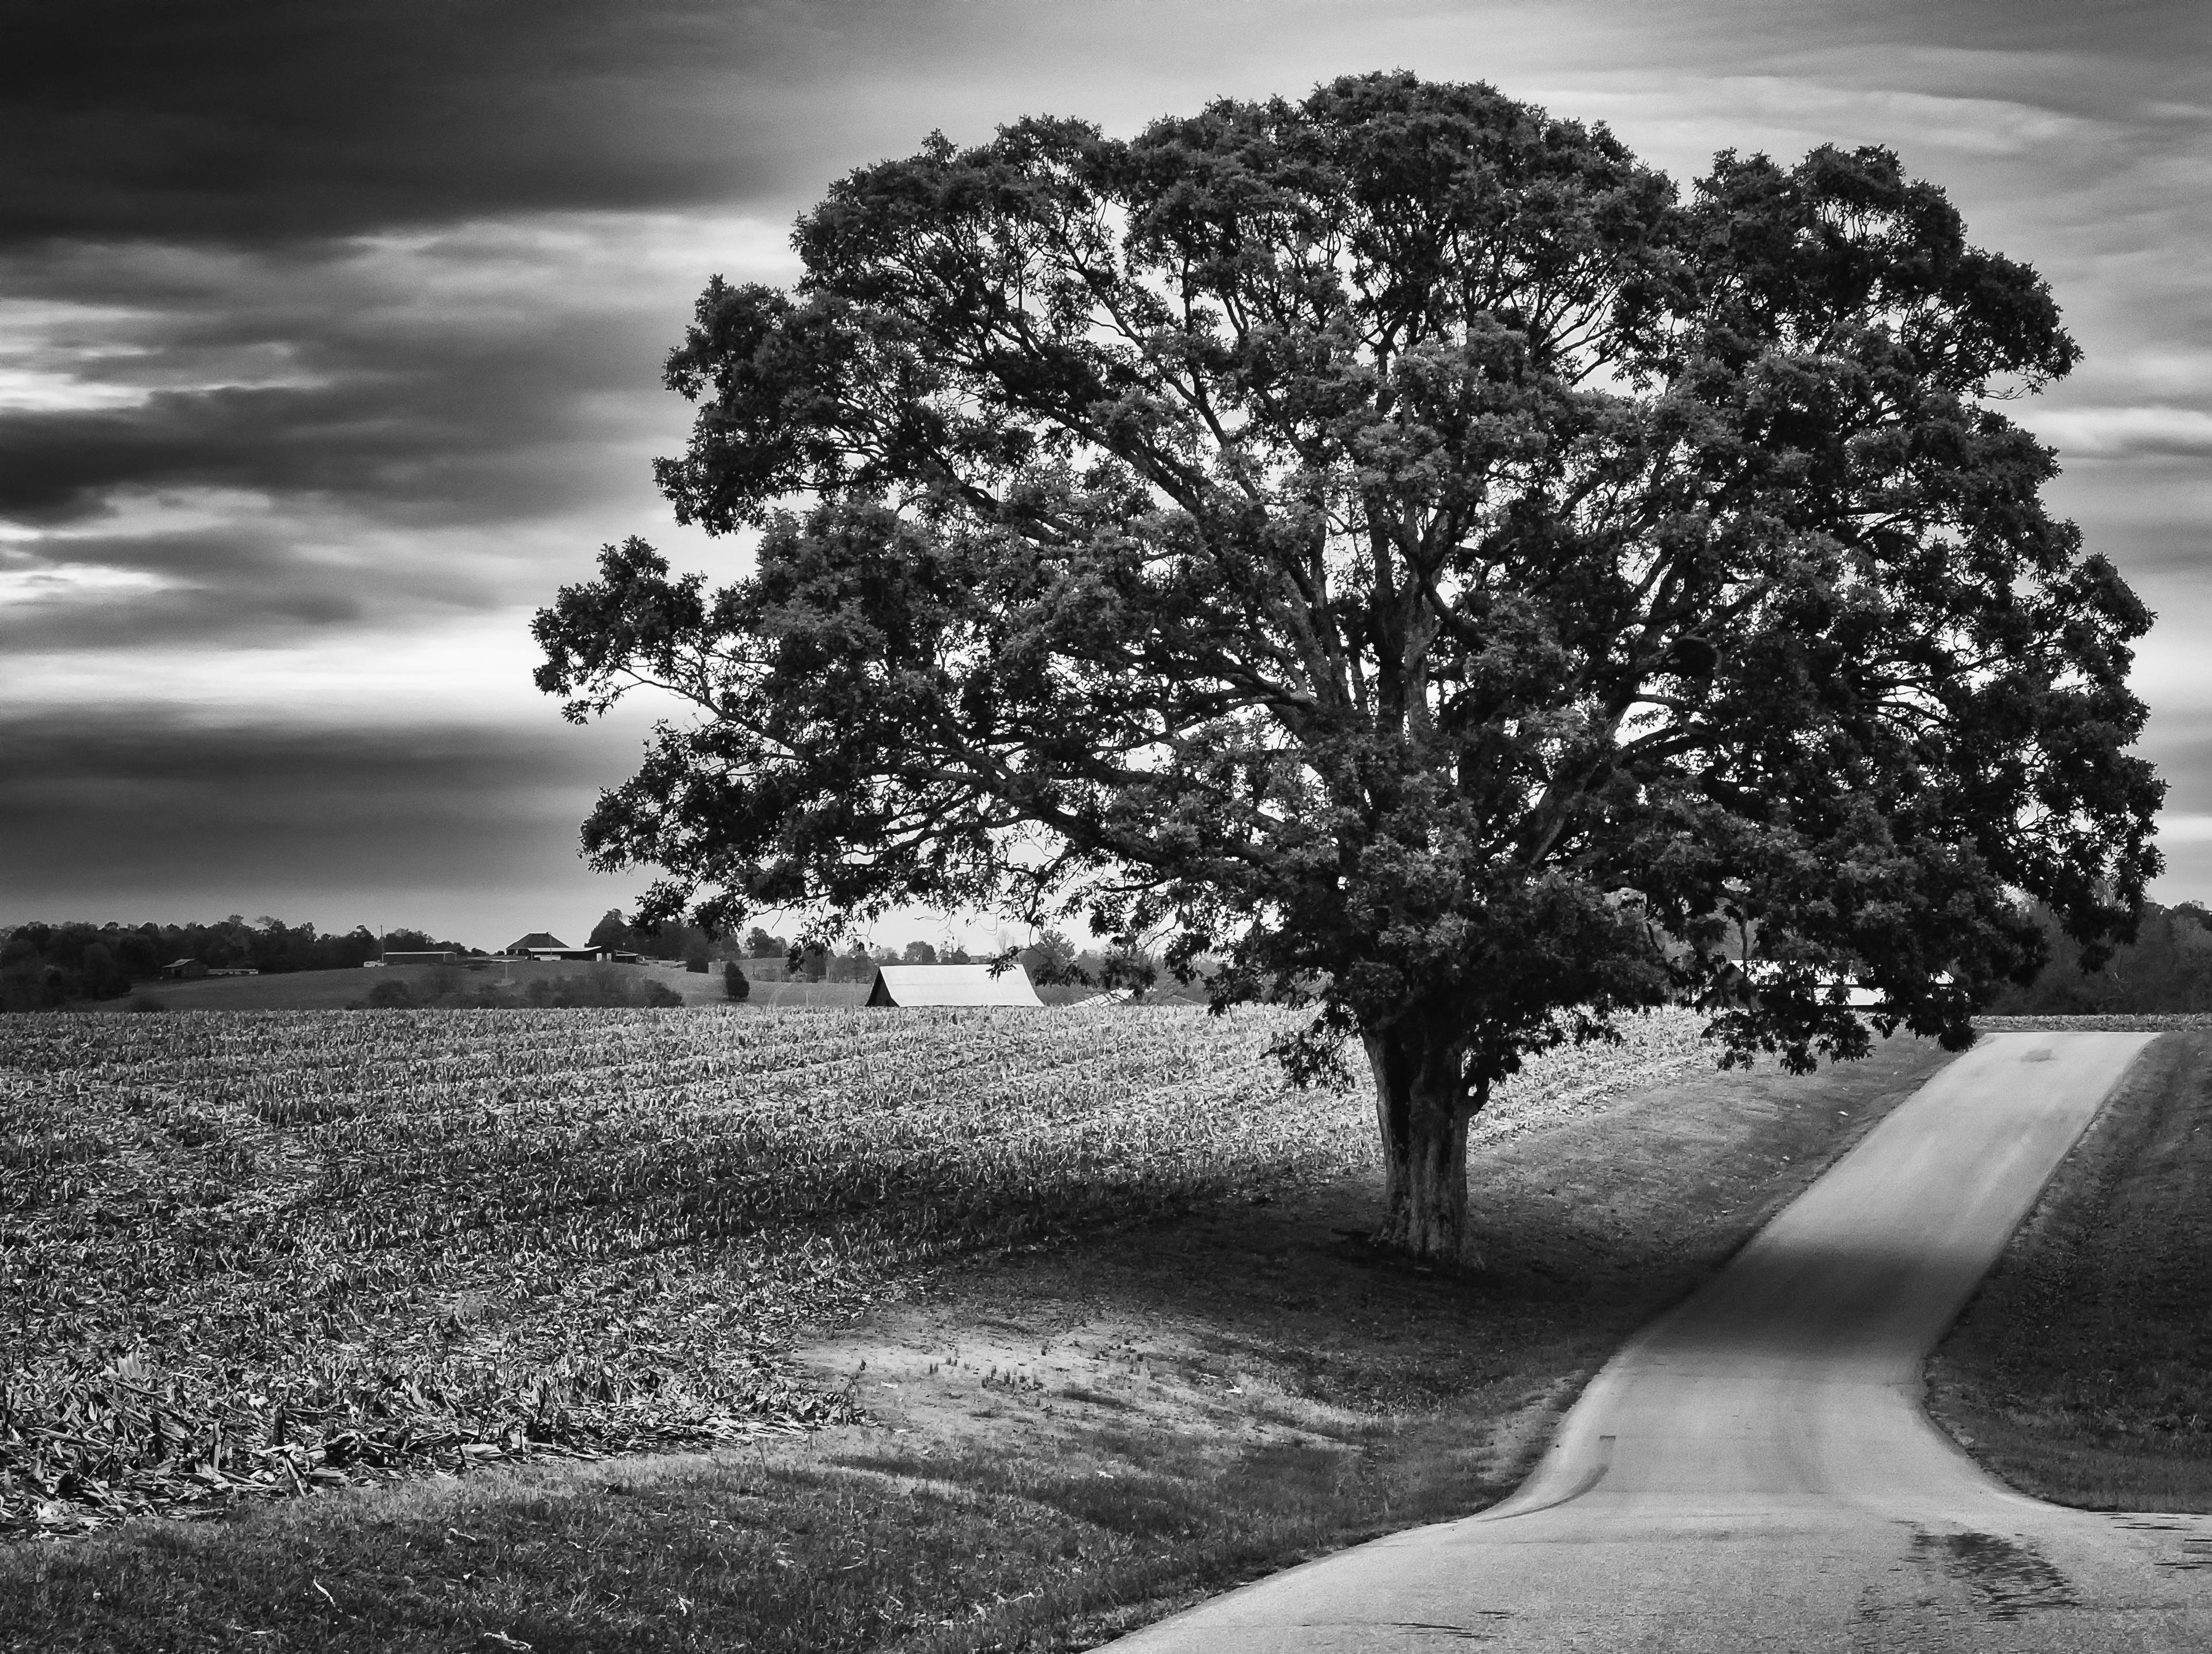 Gambar Pemandangan Pohon Alam Rumput Batu Horison Awan